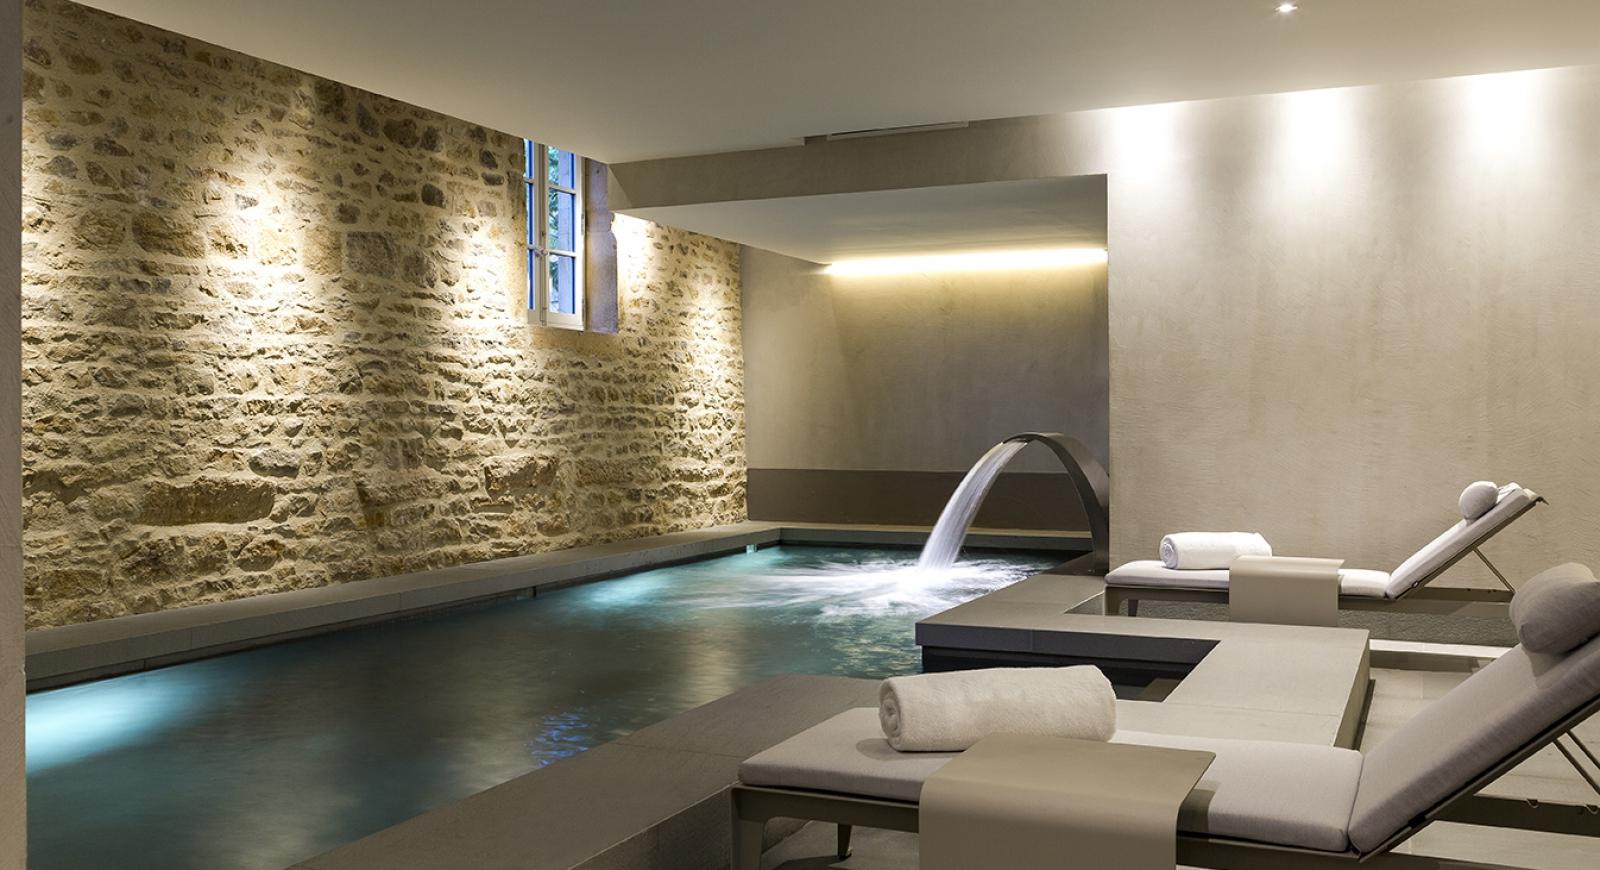 Hotel De Luxe France